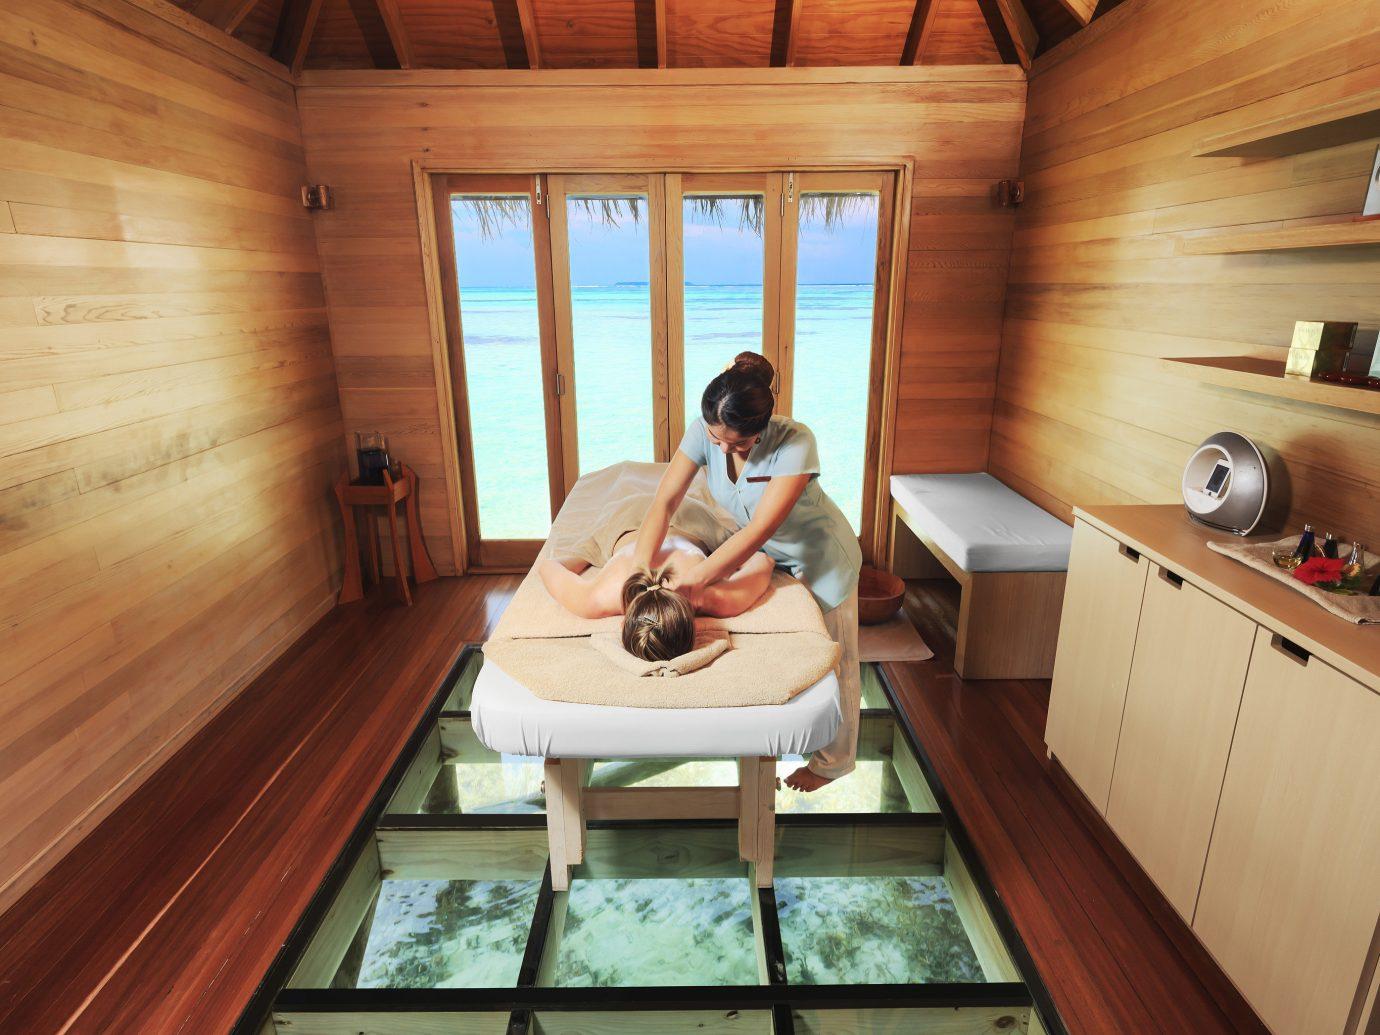 Hotels floor indoor room building ceiling swimming pool wooden estate interior design cottage wood